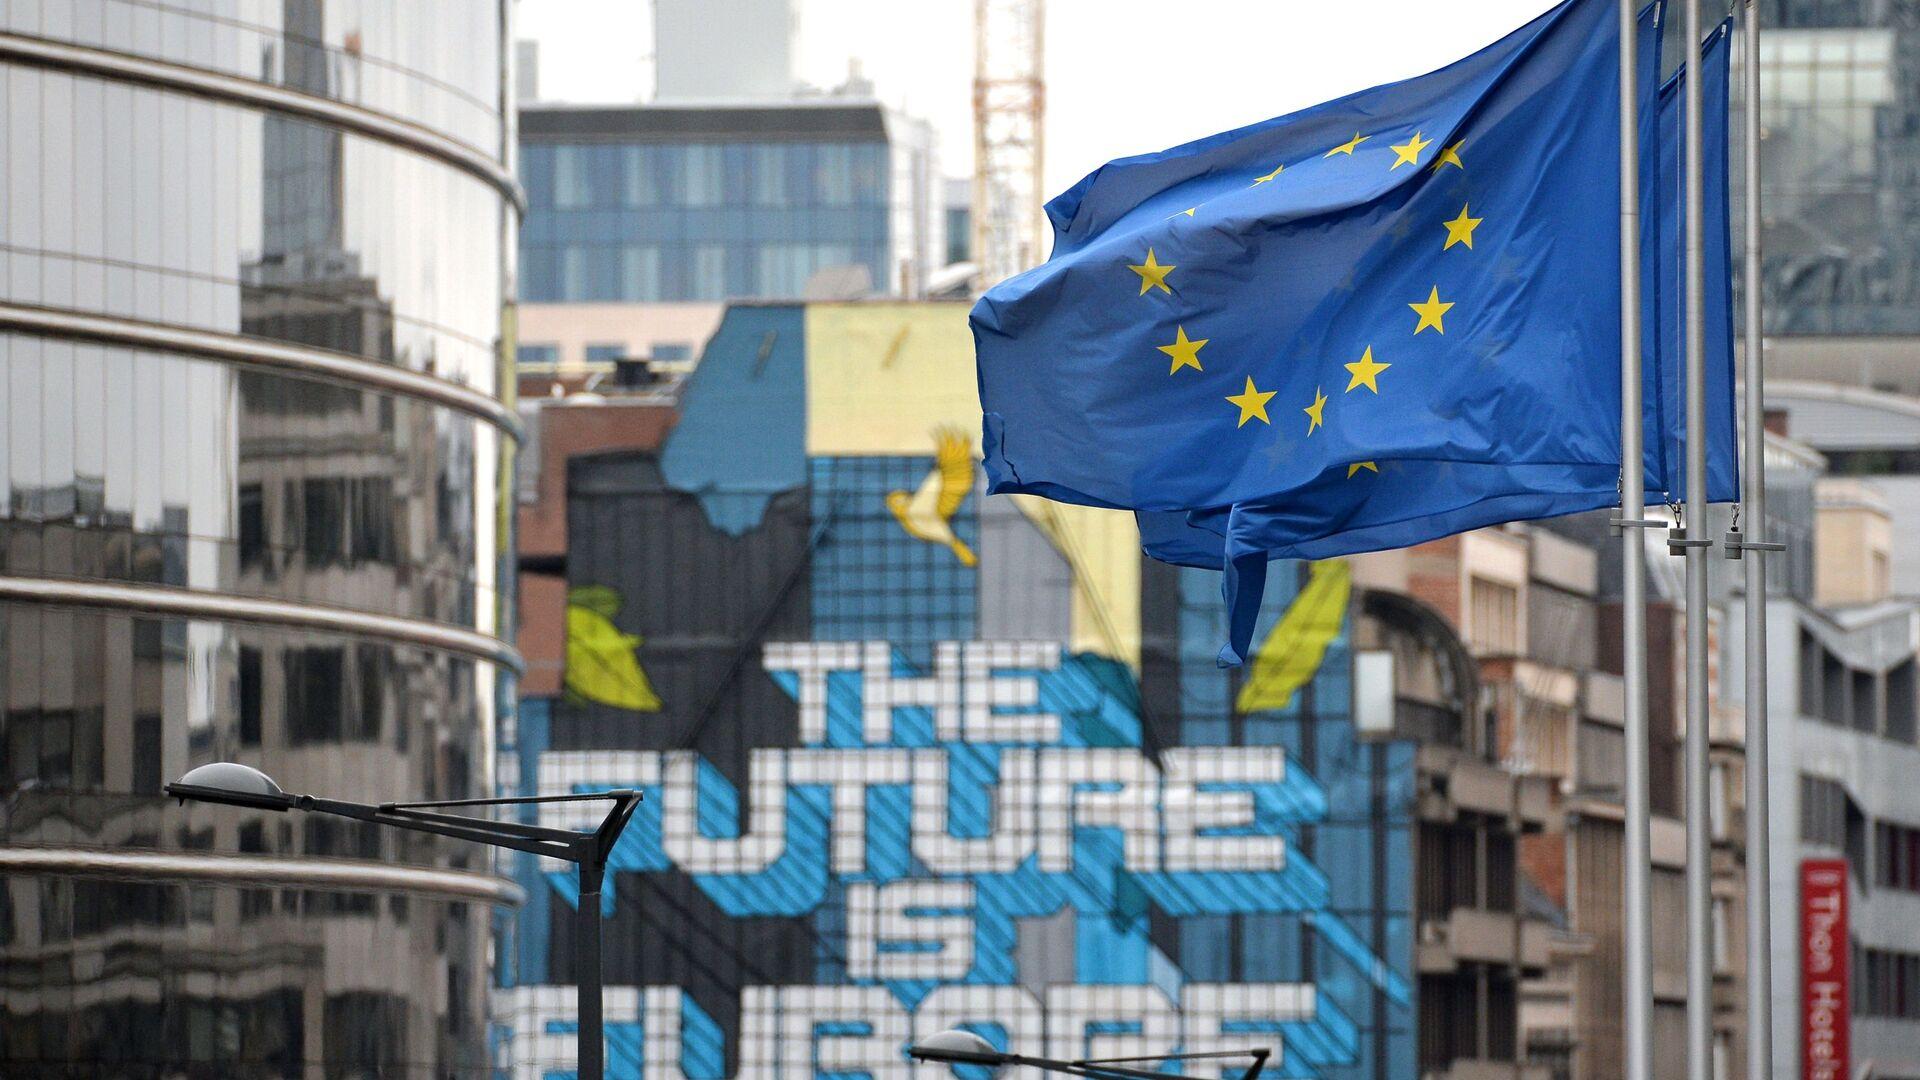 Siedziba UE w Brukseli - Sputnik Polska, 1920, 28.05.2021